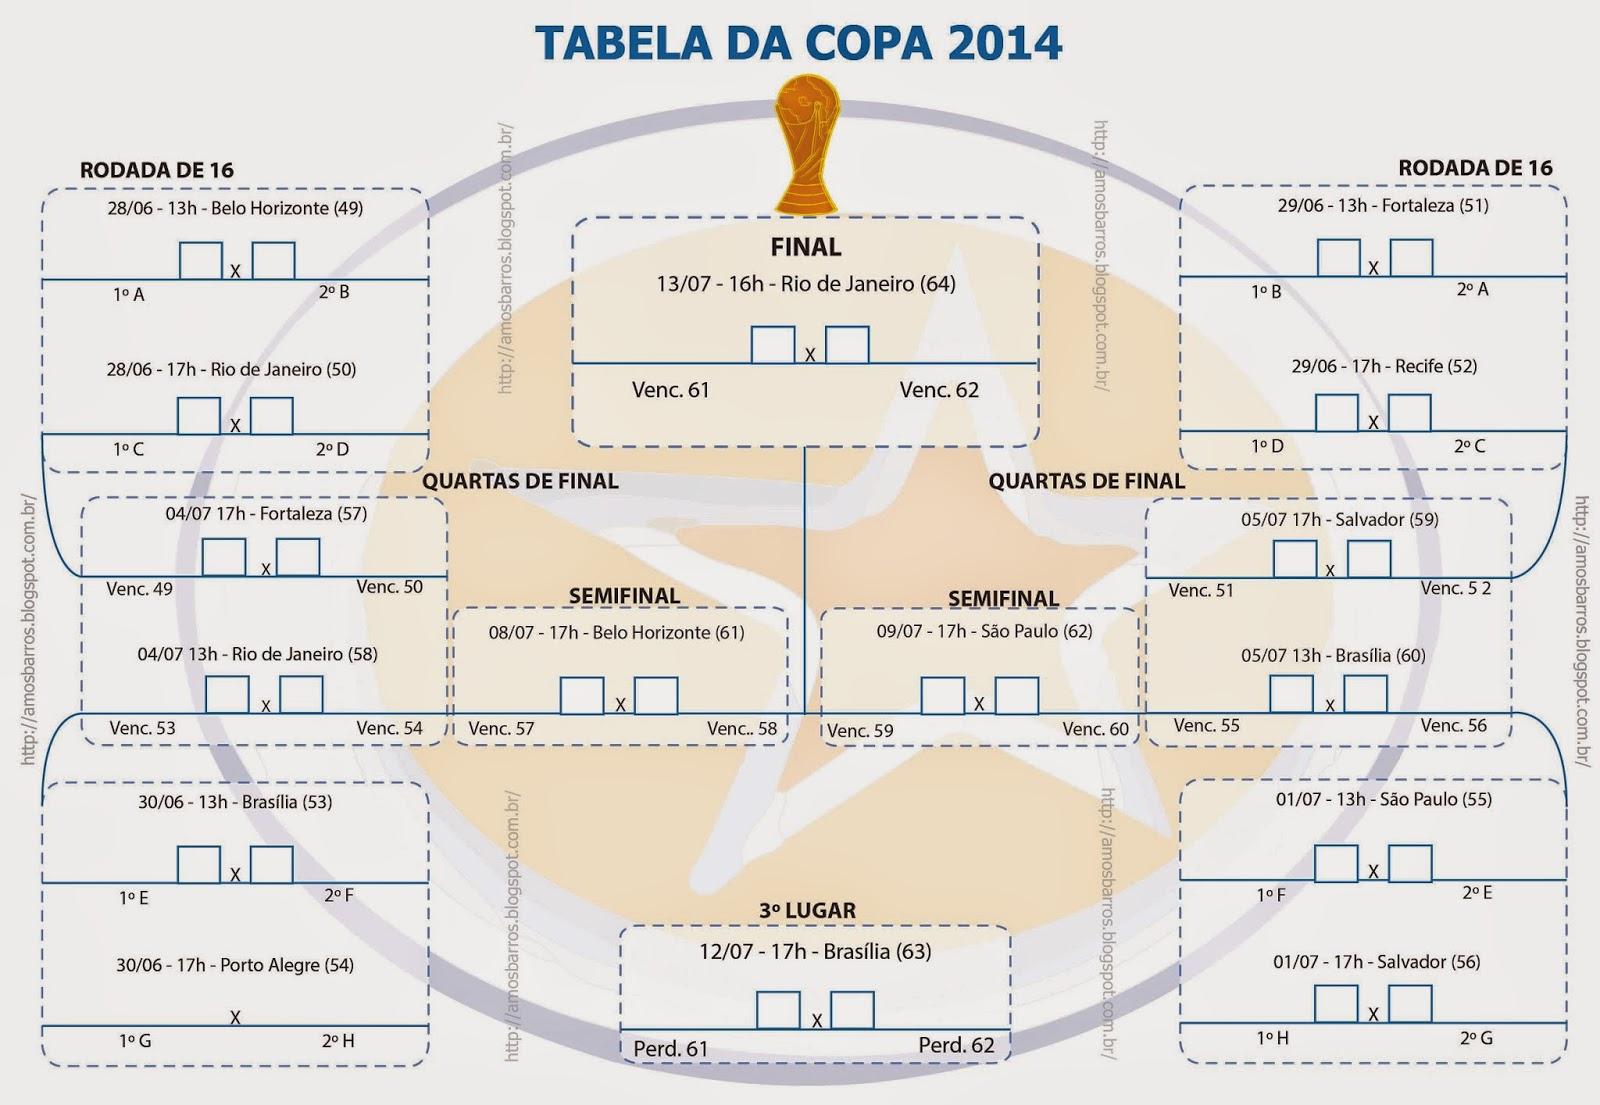 Tabela da Copa 2014 página 2